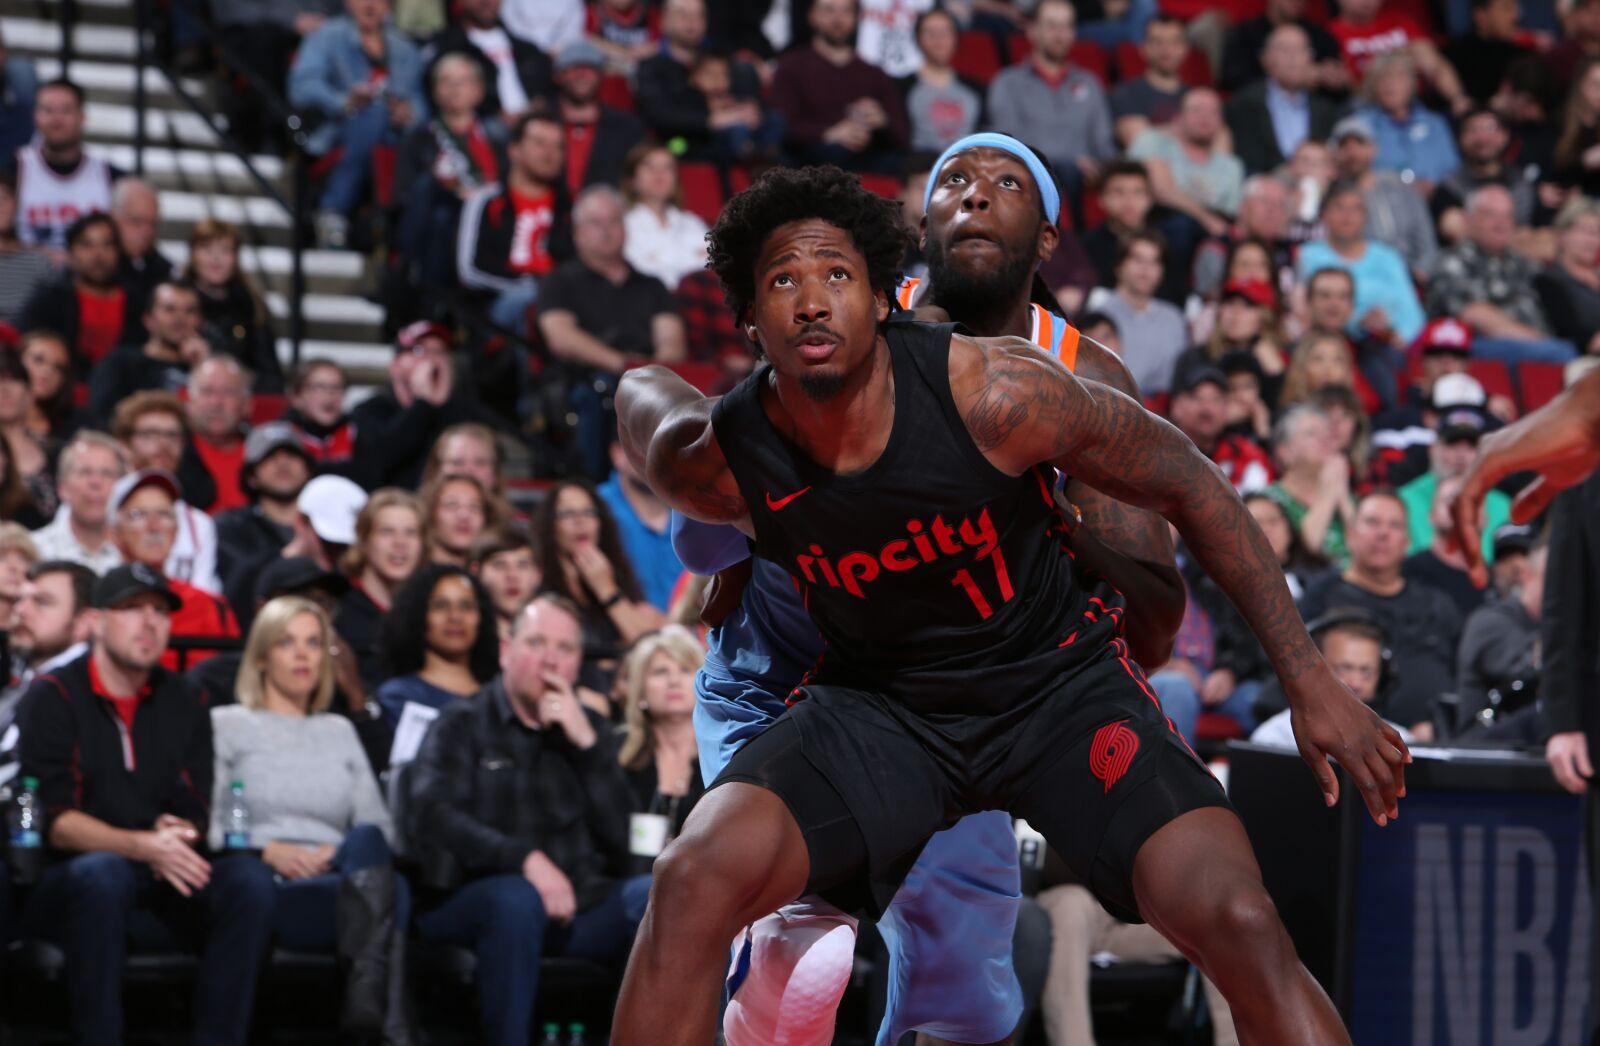 Brooklyn Nets 2018-19 Primer: Ed Davis brings depth to frontcourt